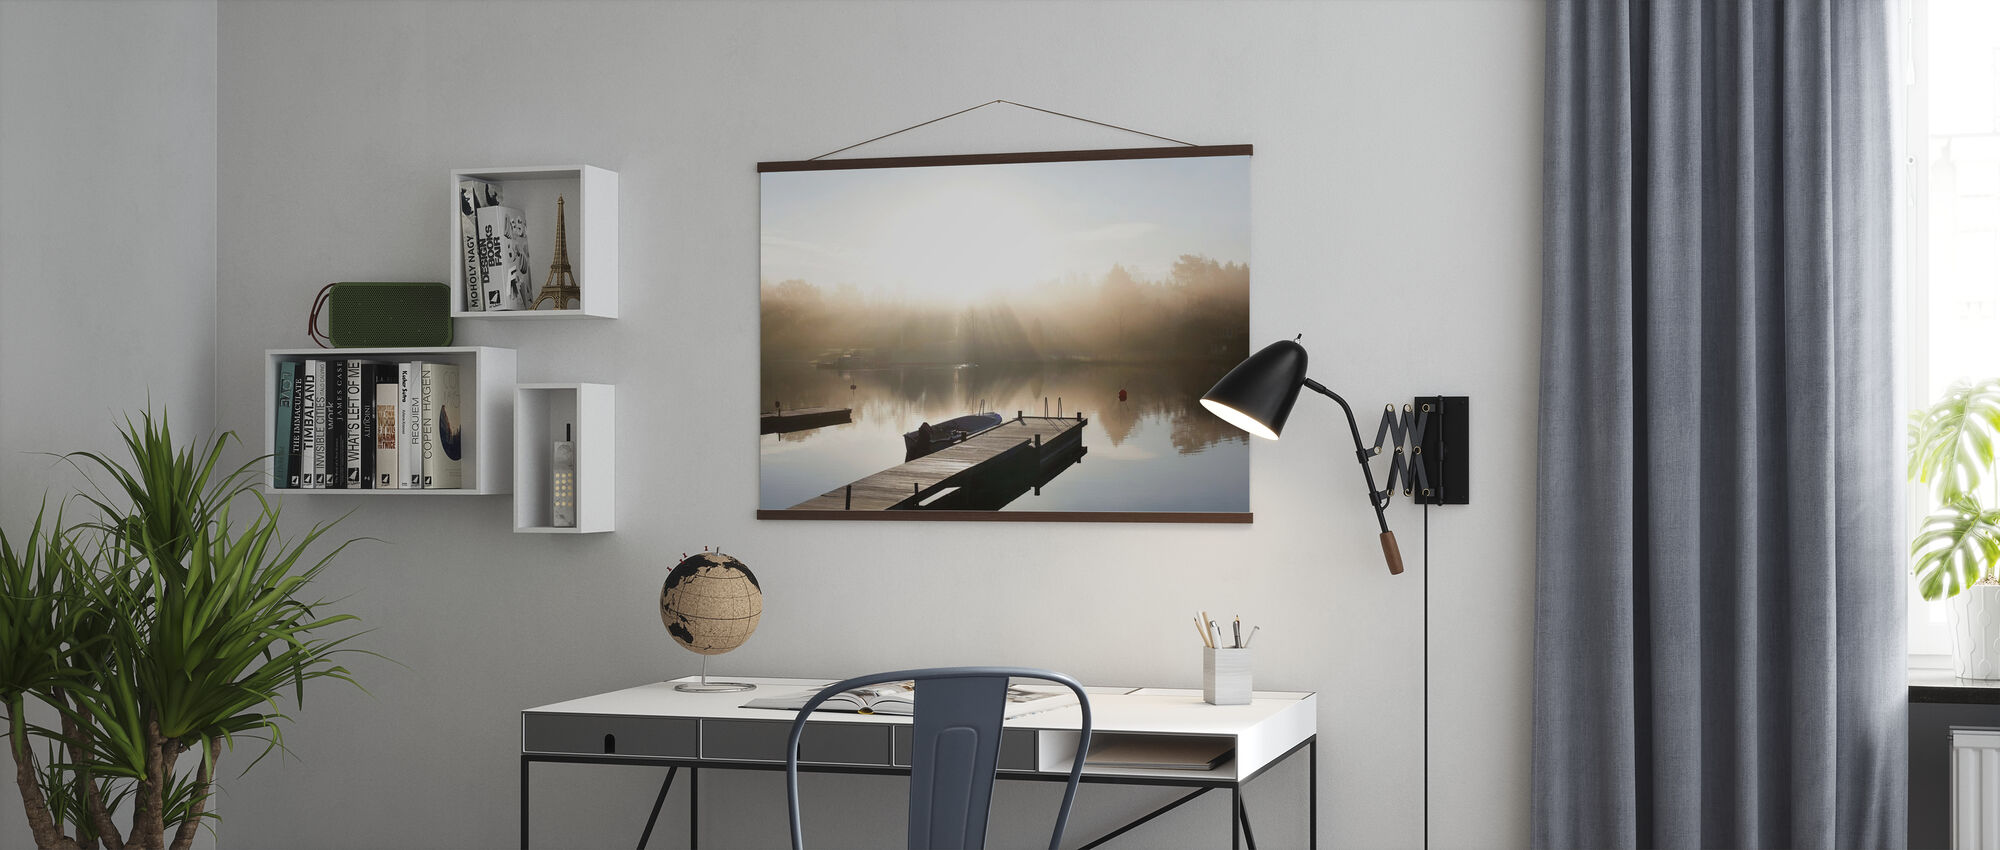 Pier in Roslagen, Sweden - Poster - Office